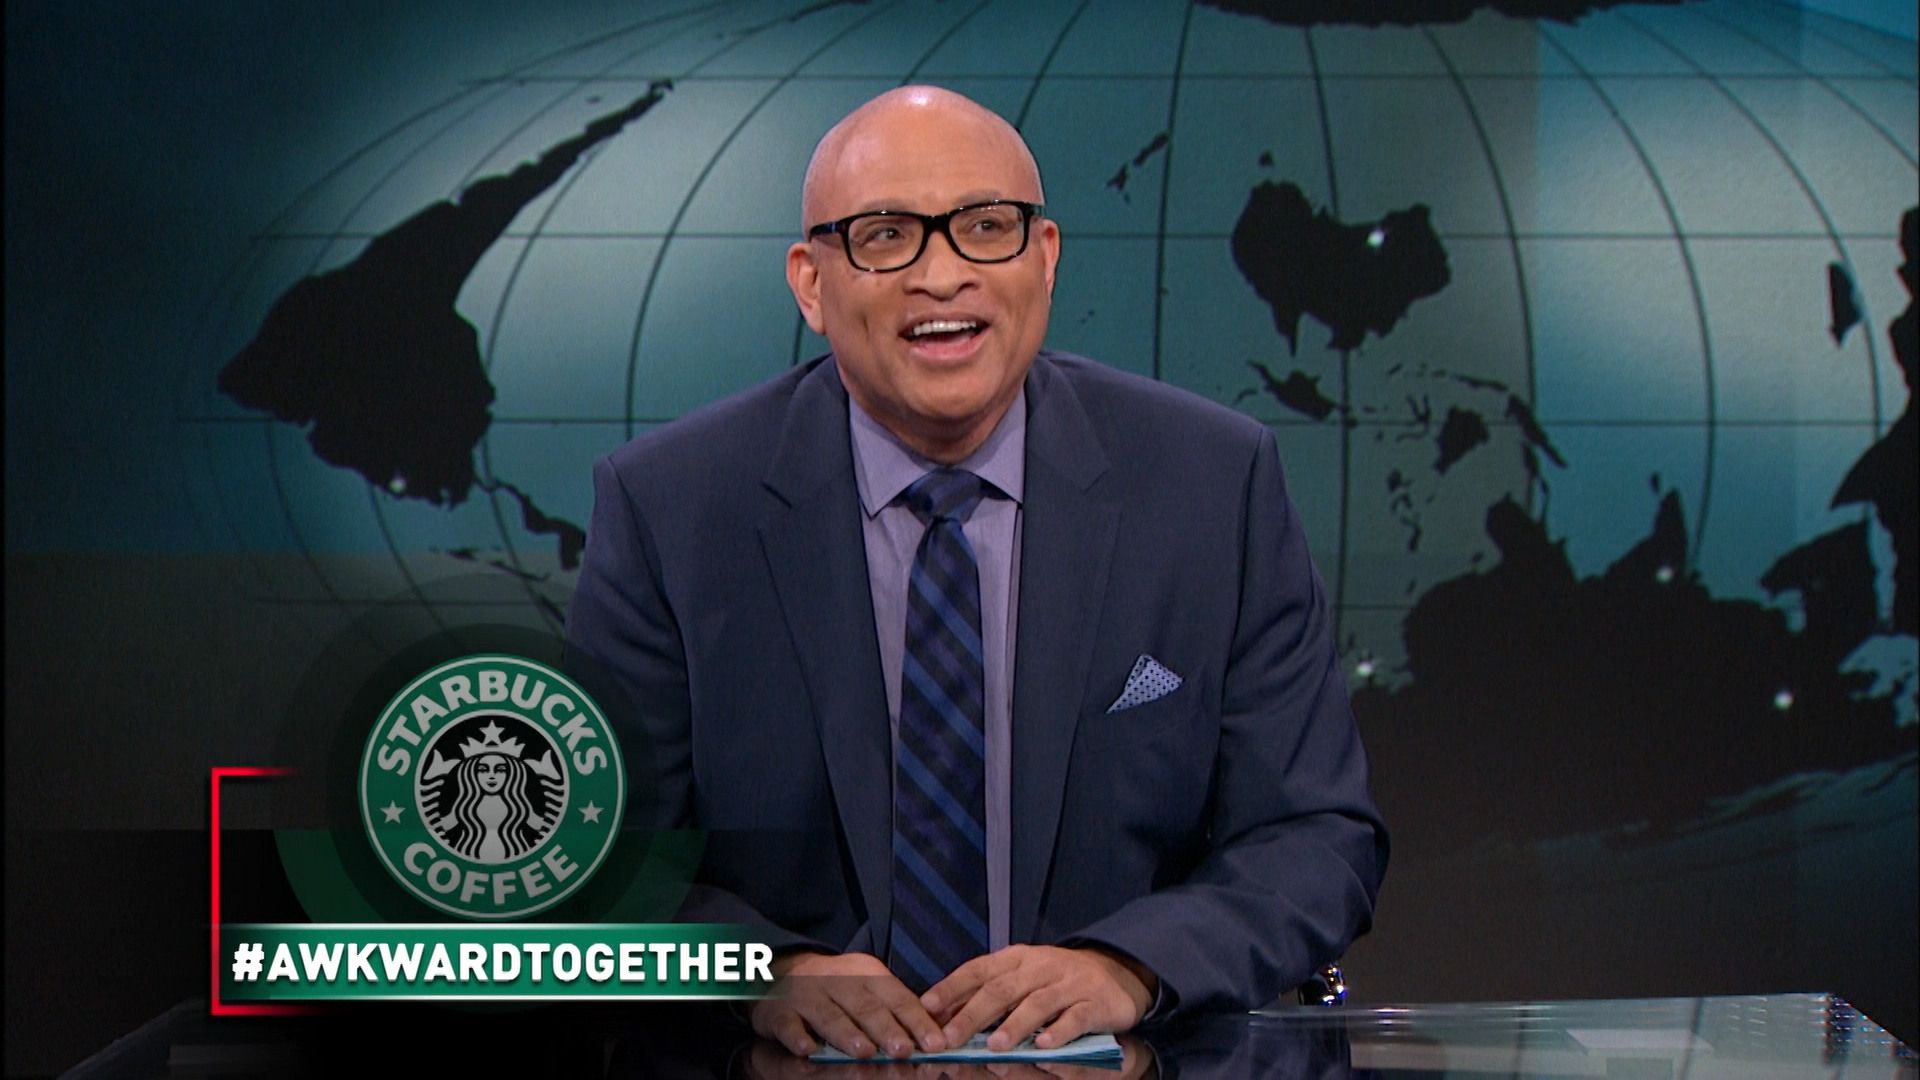 March 23, 2015 - Starbucks's